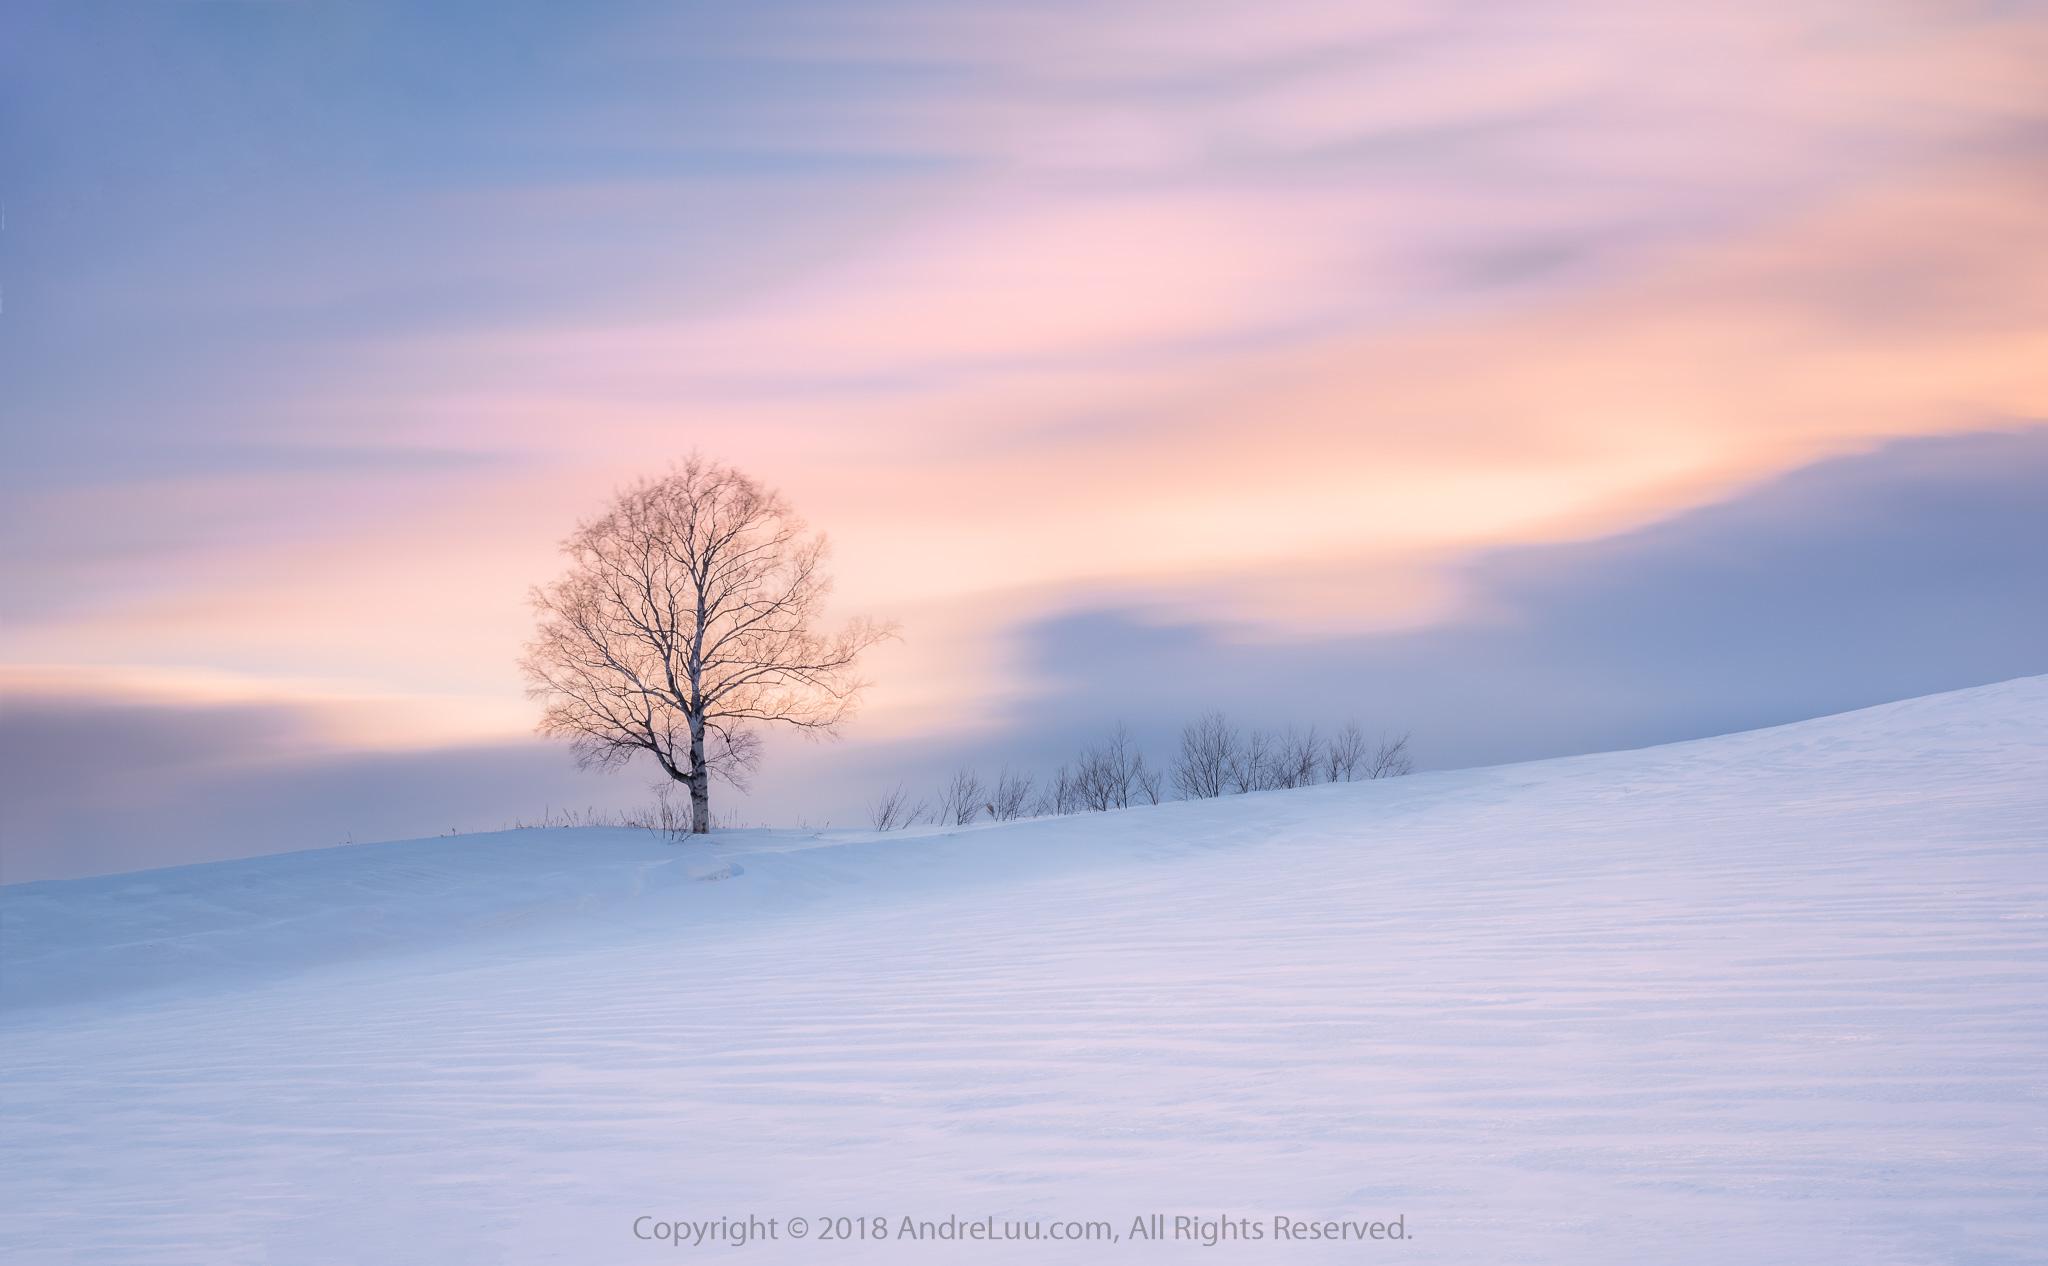 Tuyết Băng Ánh Hồng (Pink Icy Snow) 103s f/11 ISO 50 WB 8000K. Sony a7r3 + Sony 24-70 f/2.8 GM @ 50mm. Hokkaido, Japan.